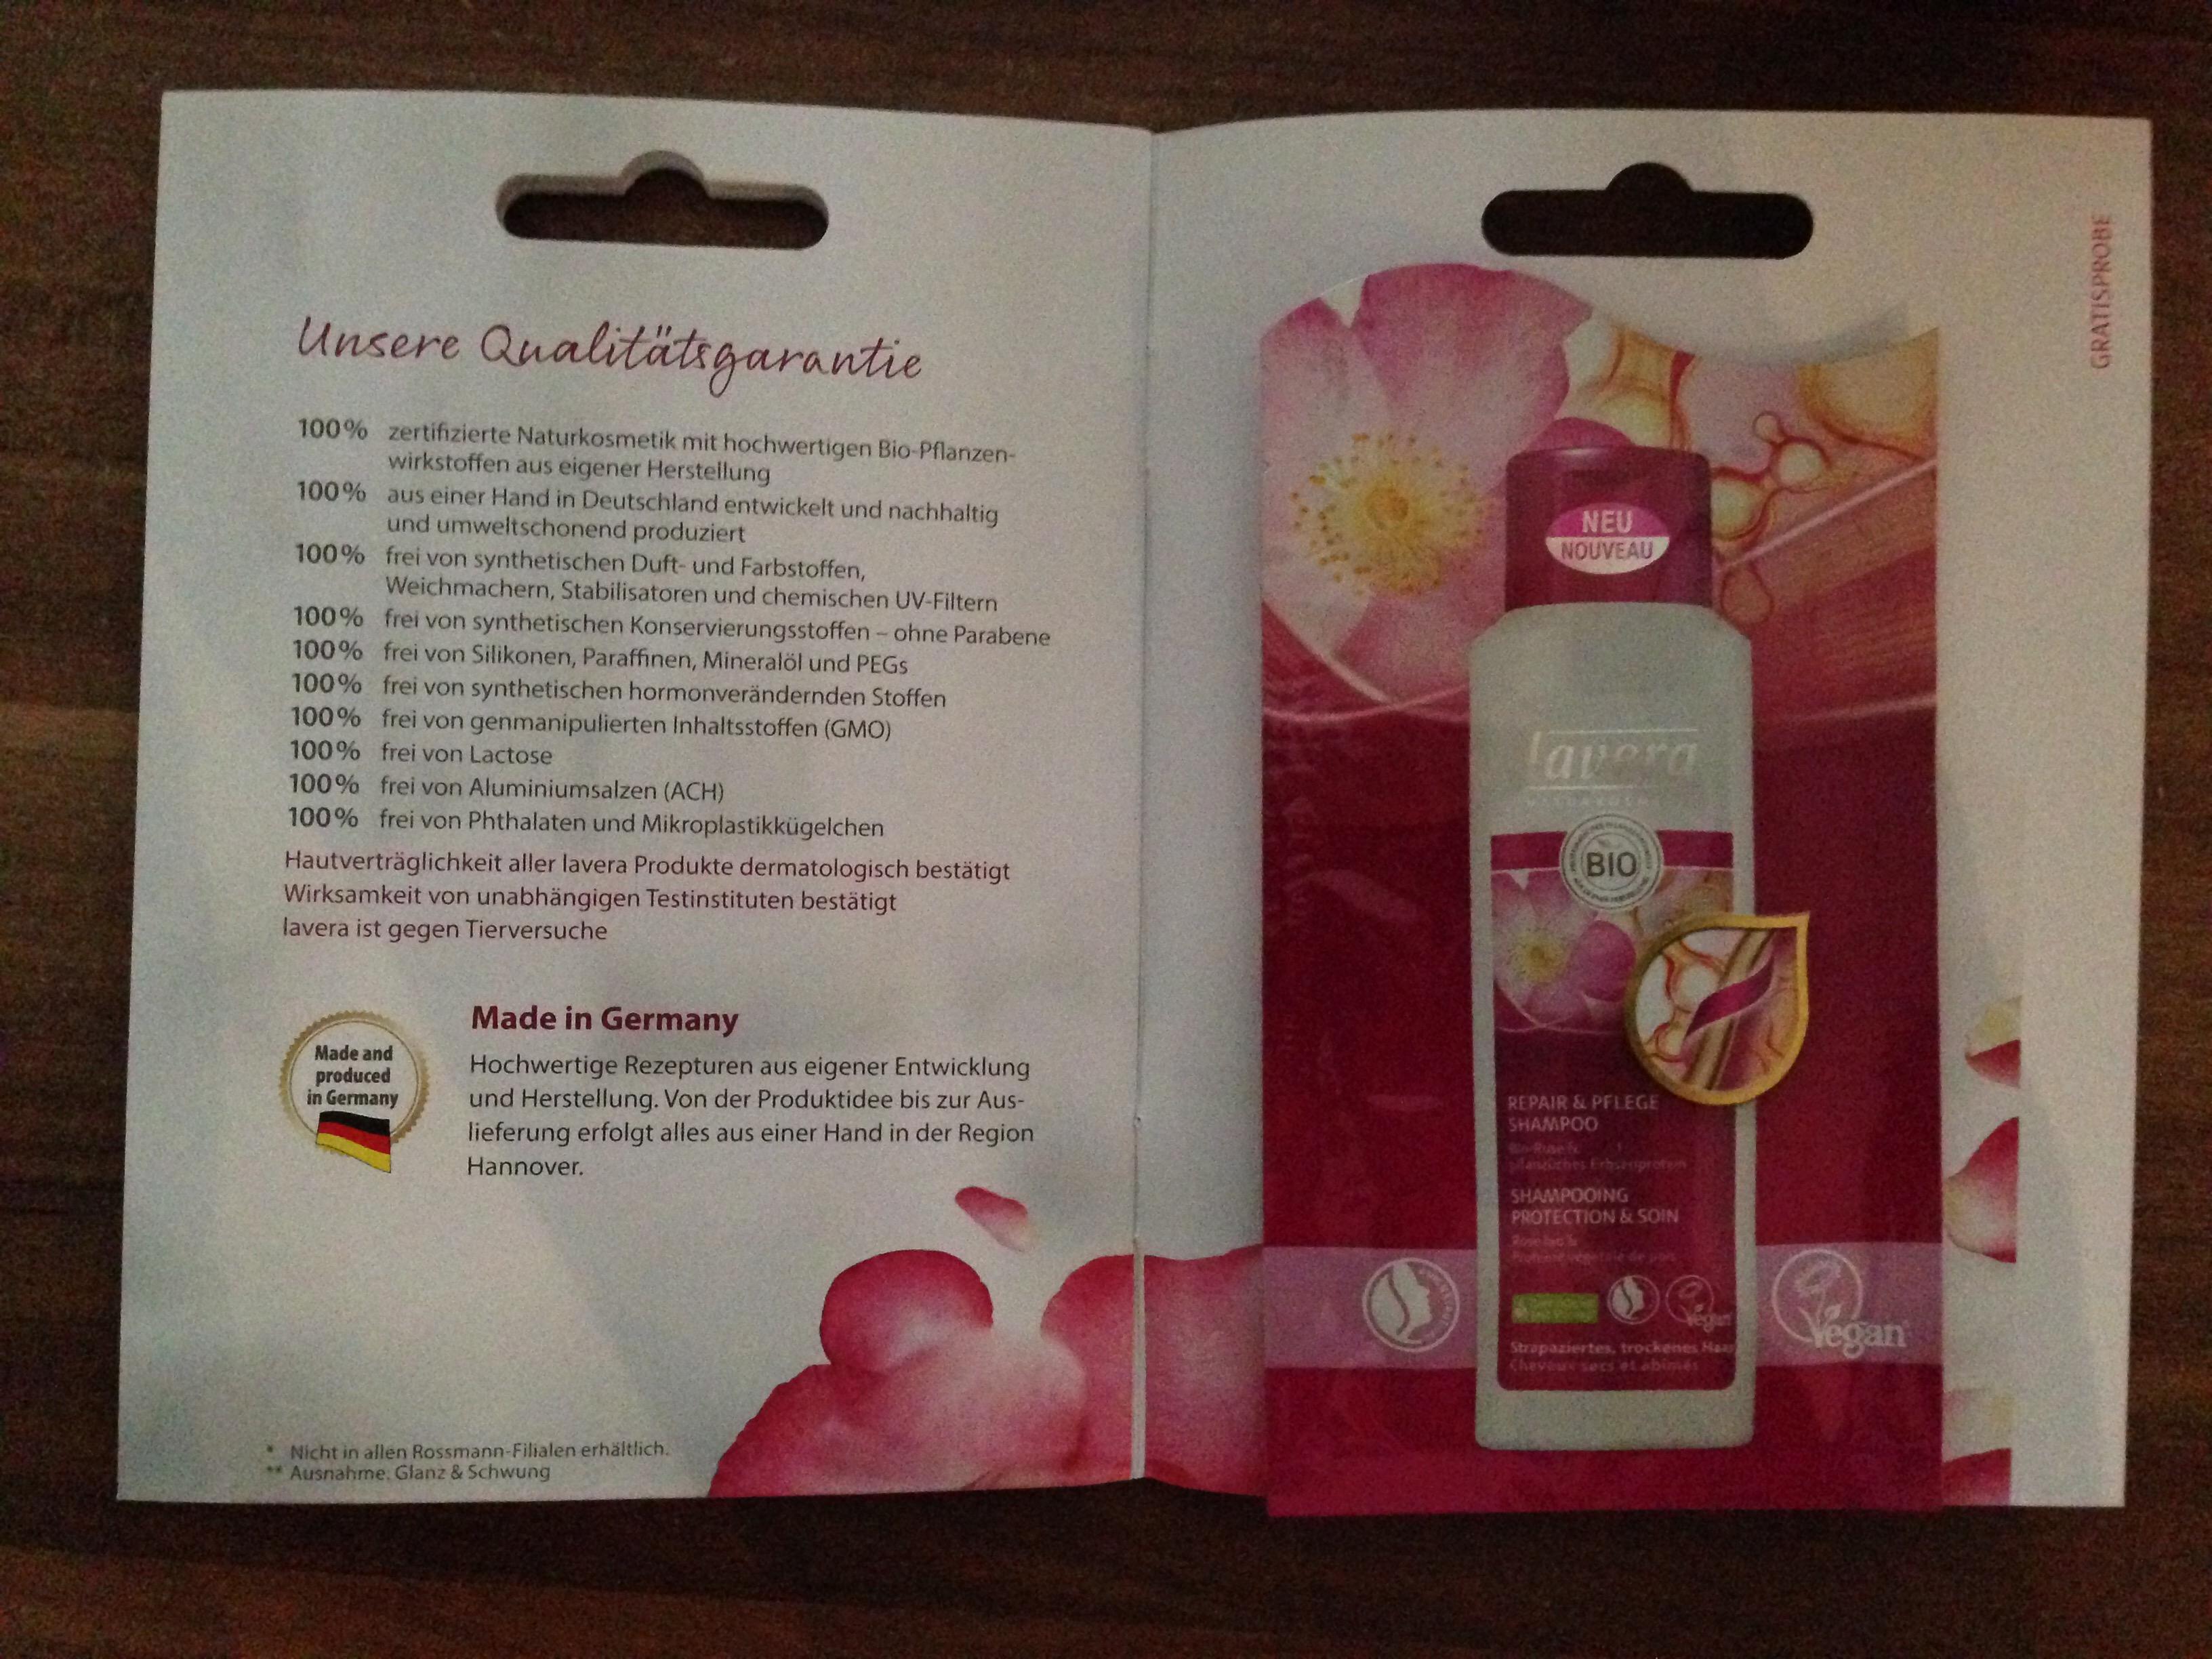 Rossmann - Gratis-Probe - Lavera Repair & Pflege Shampoo - 10ml